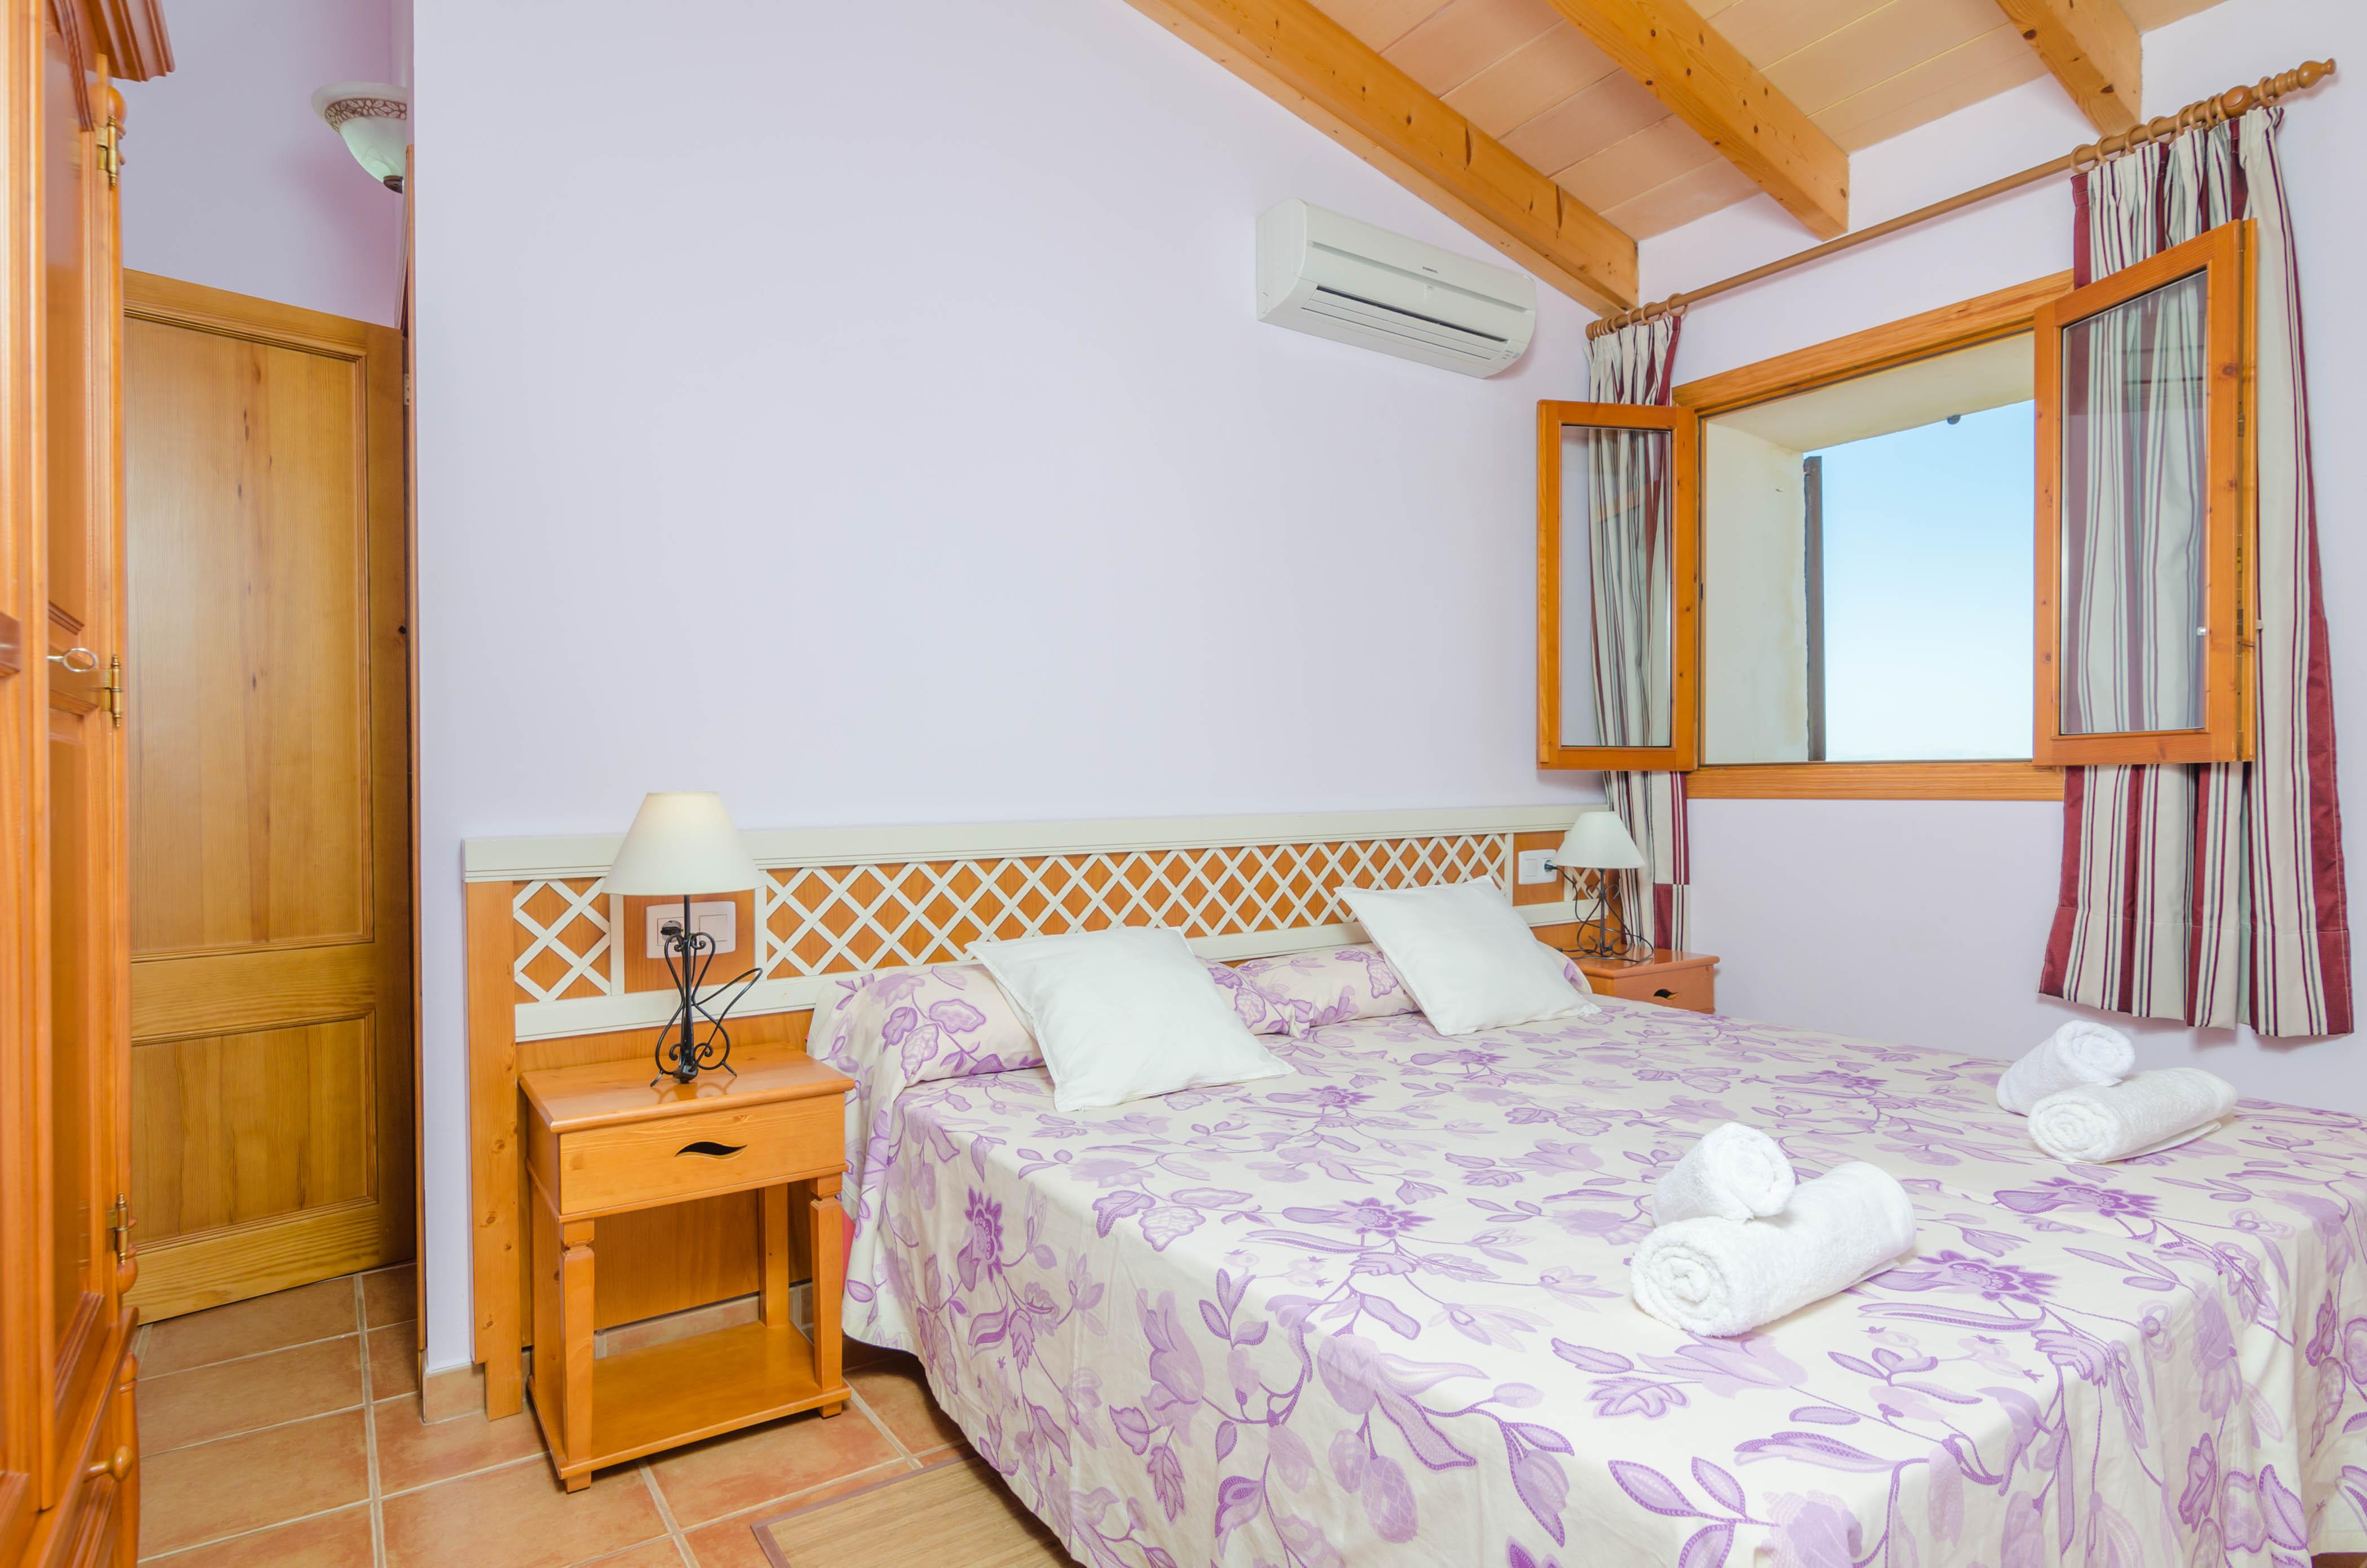 Ferienhaus SON MACIA (2186582), Son Macià, Mallorca, Balearische Inseln, Spanien, Bild 33